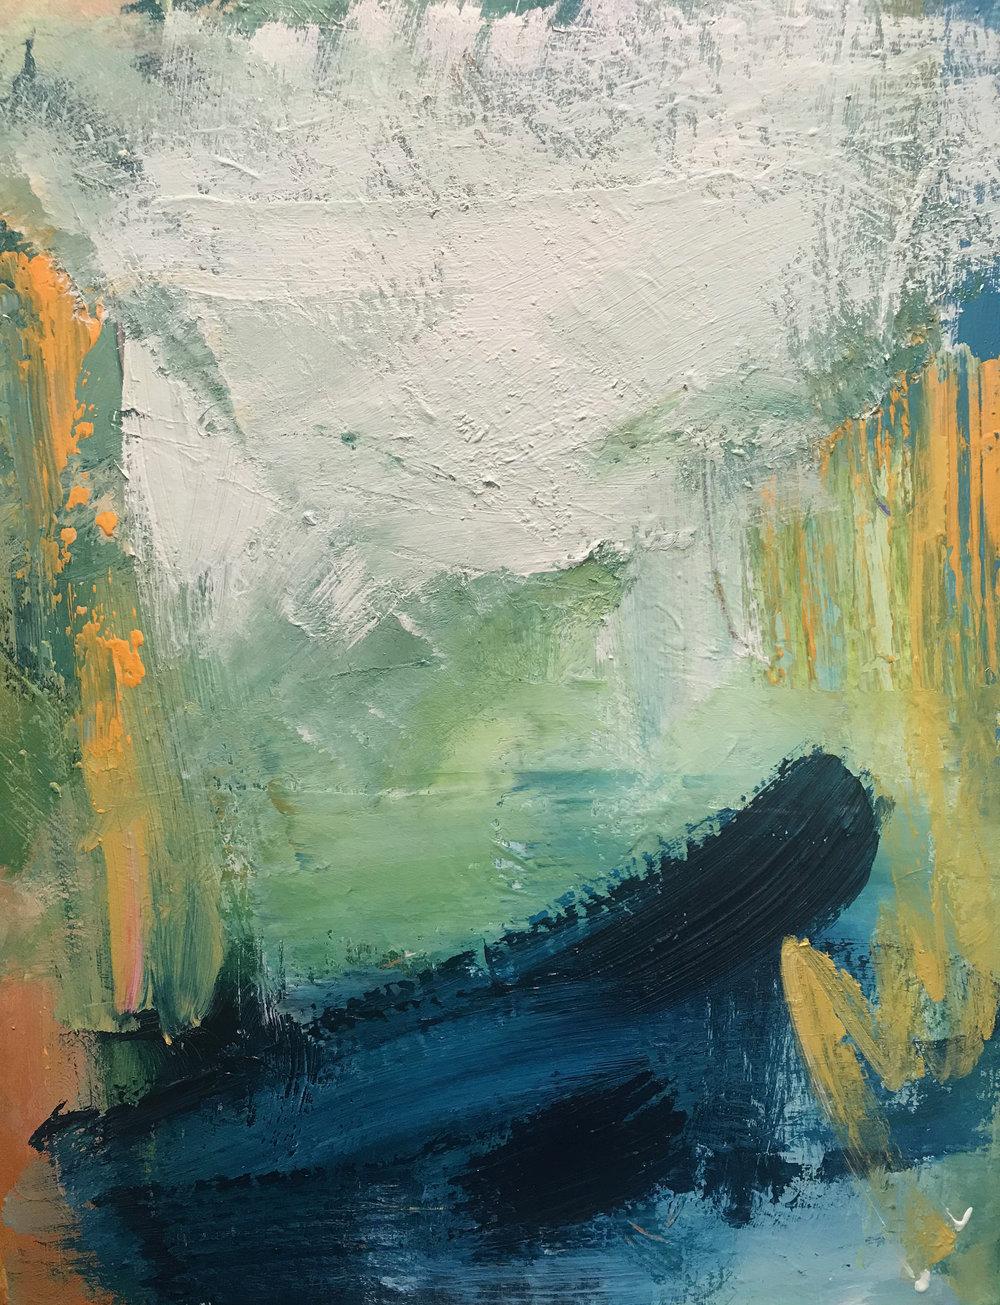 18 x 20 Acrylic and mixed media on canvas.